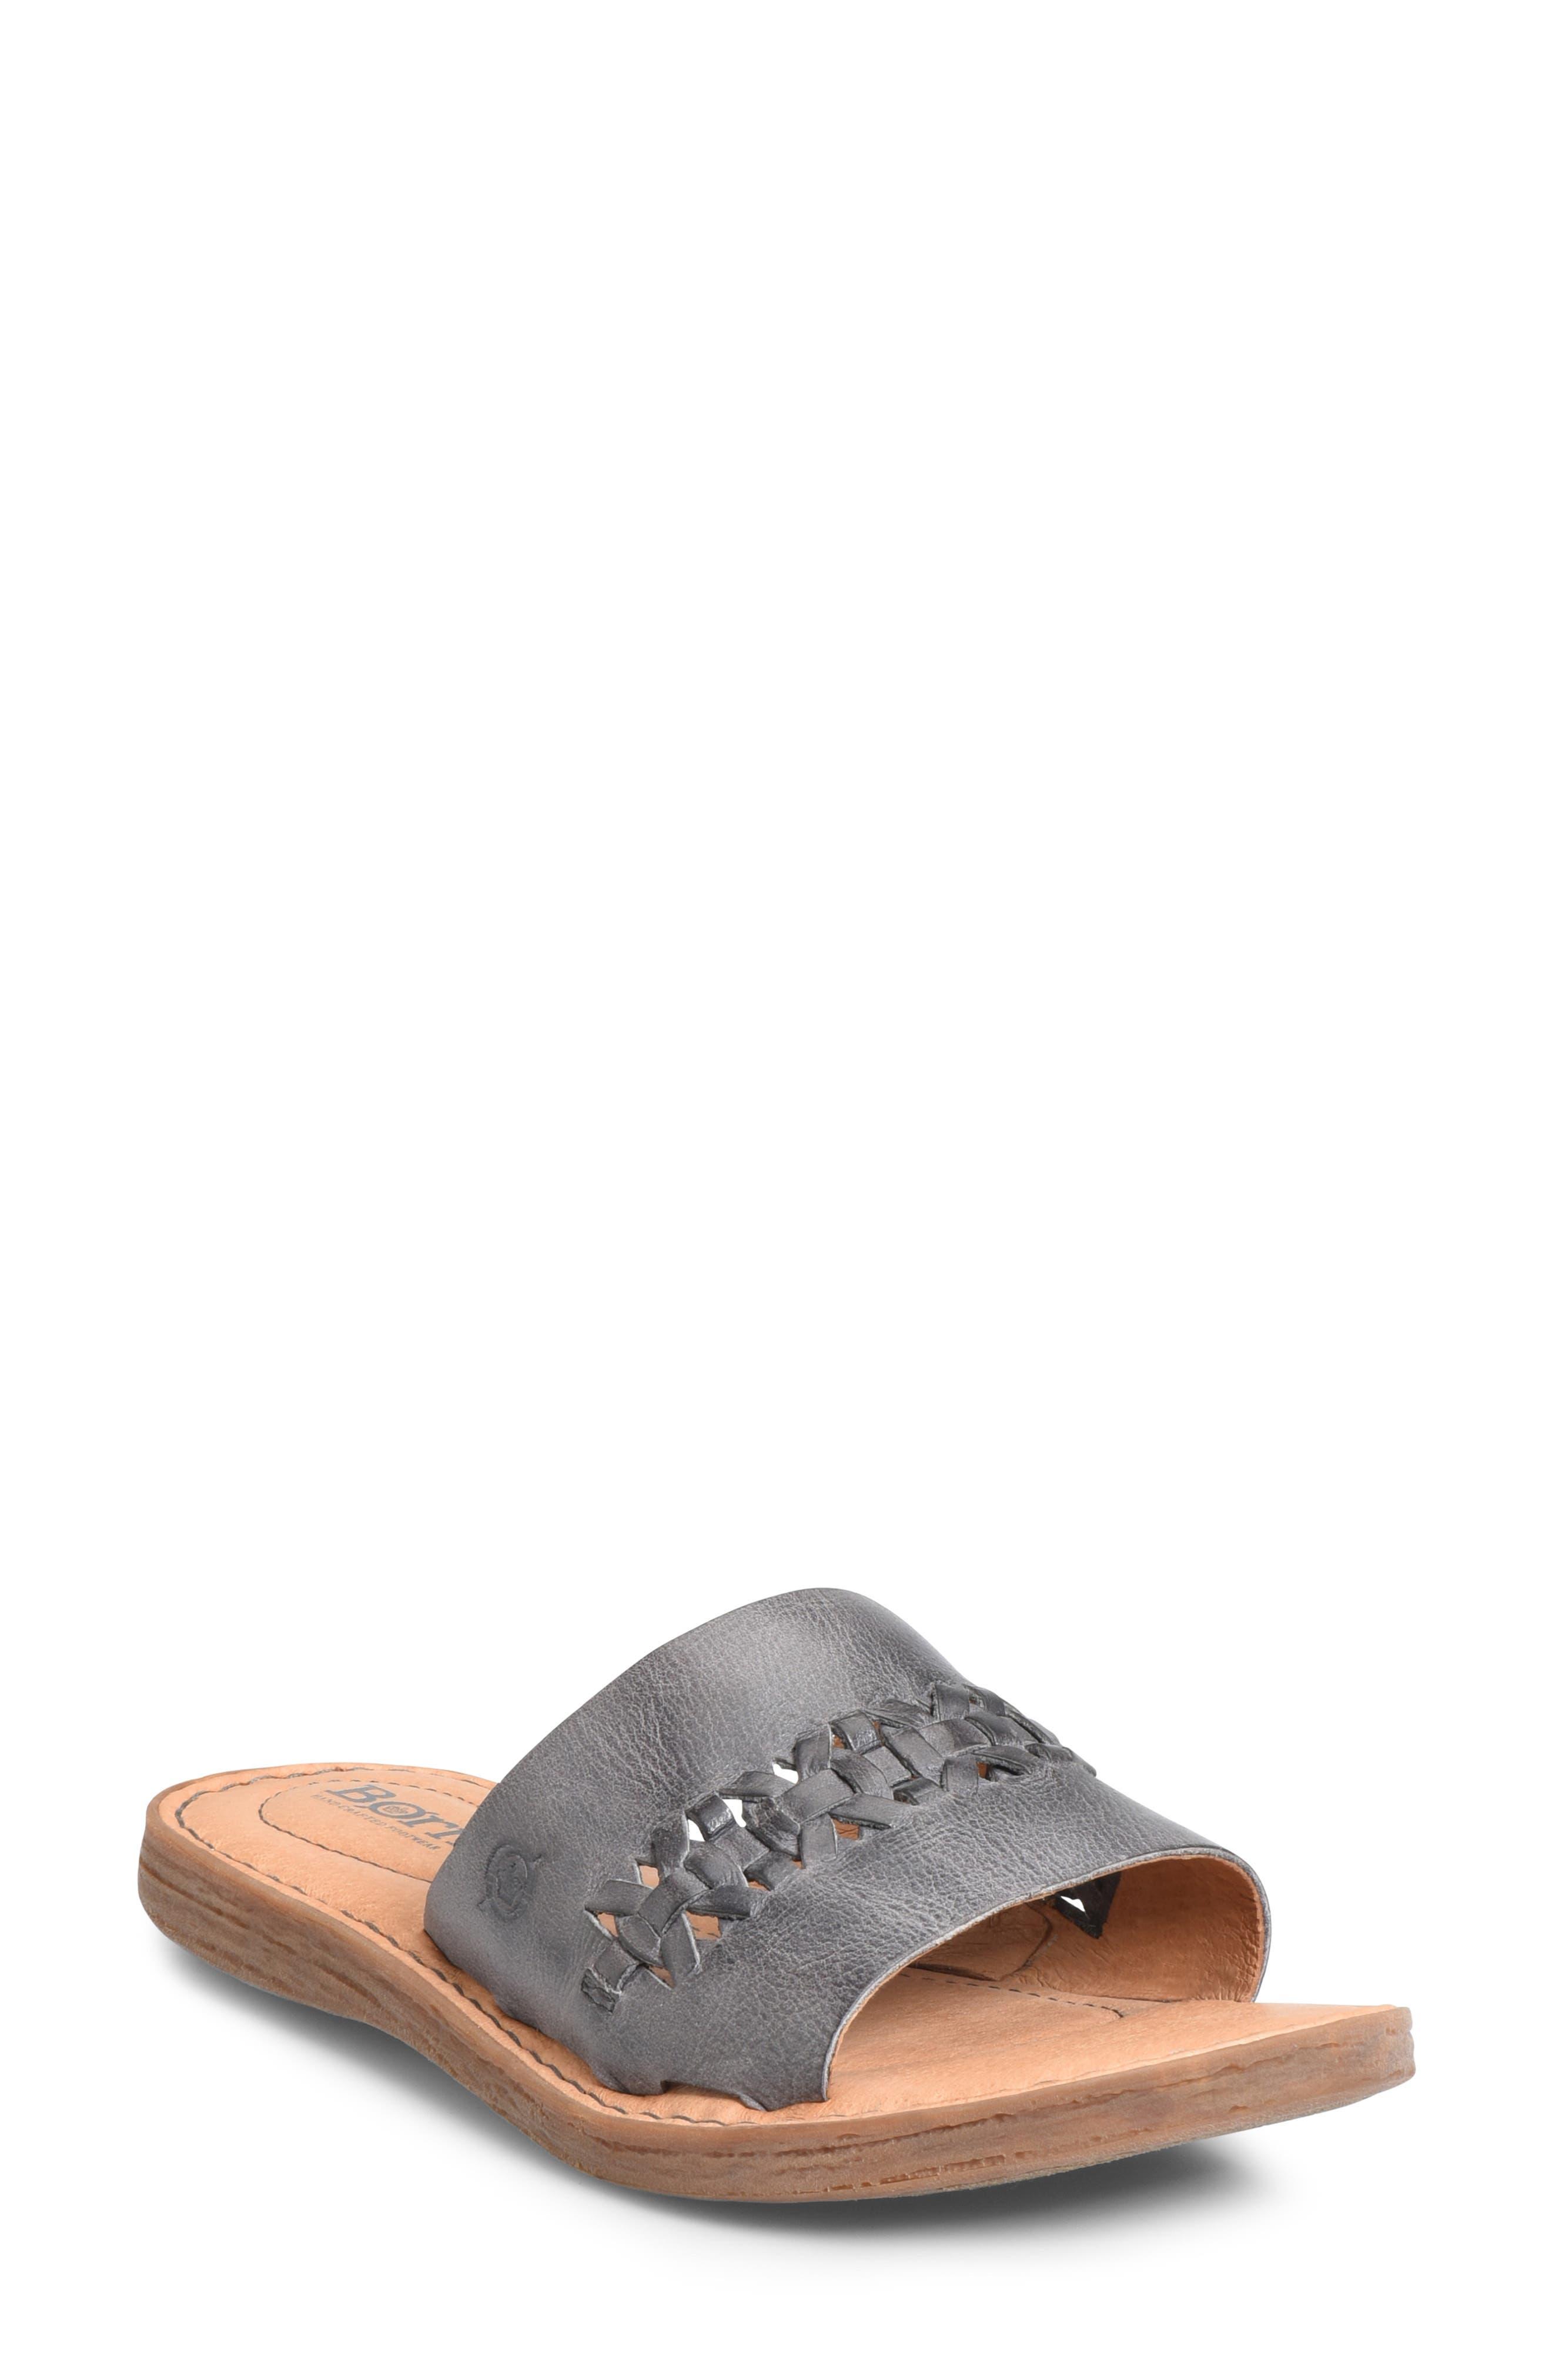 B?rn St. Francis Slide Sandal, Grey